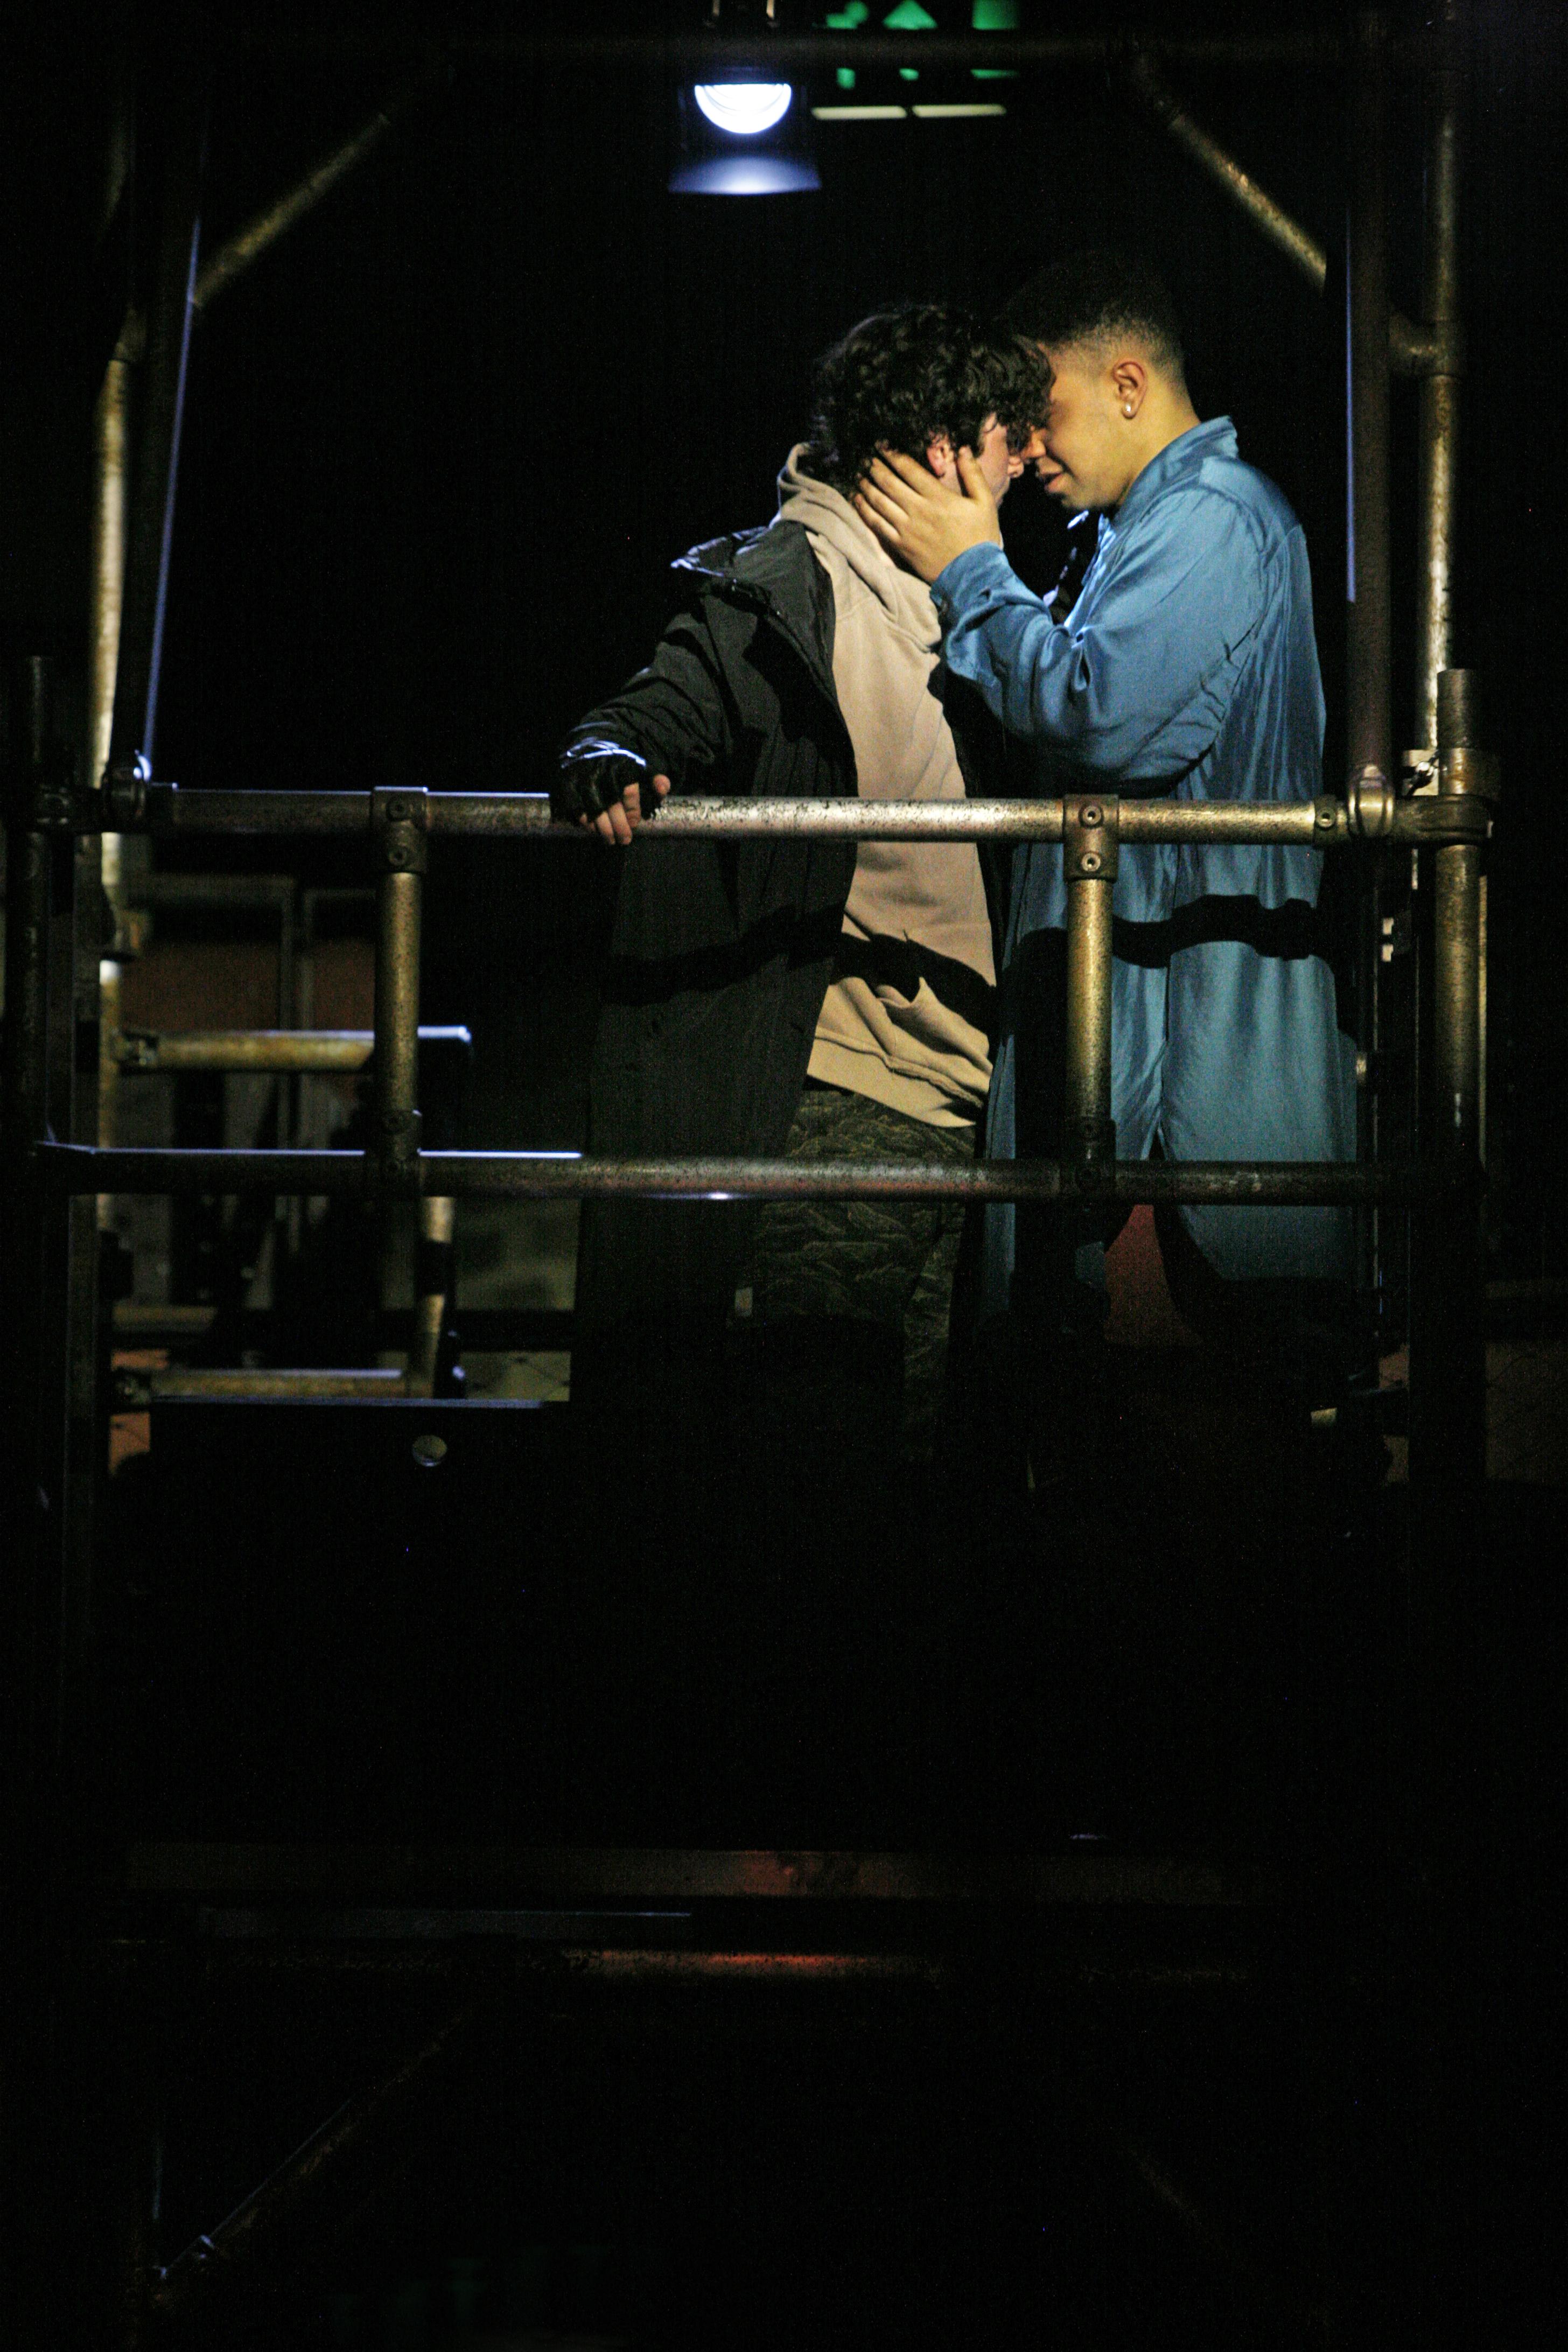 George Caple & Elliott Kingsley in Romeo & Juliet, photo by Gary Calton GC270517046 #